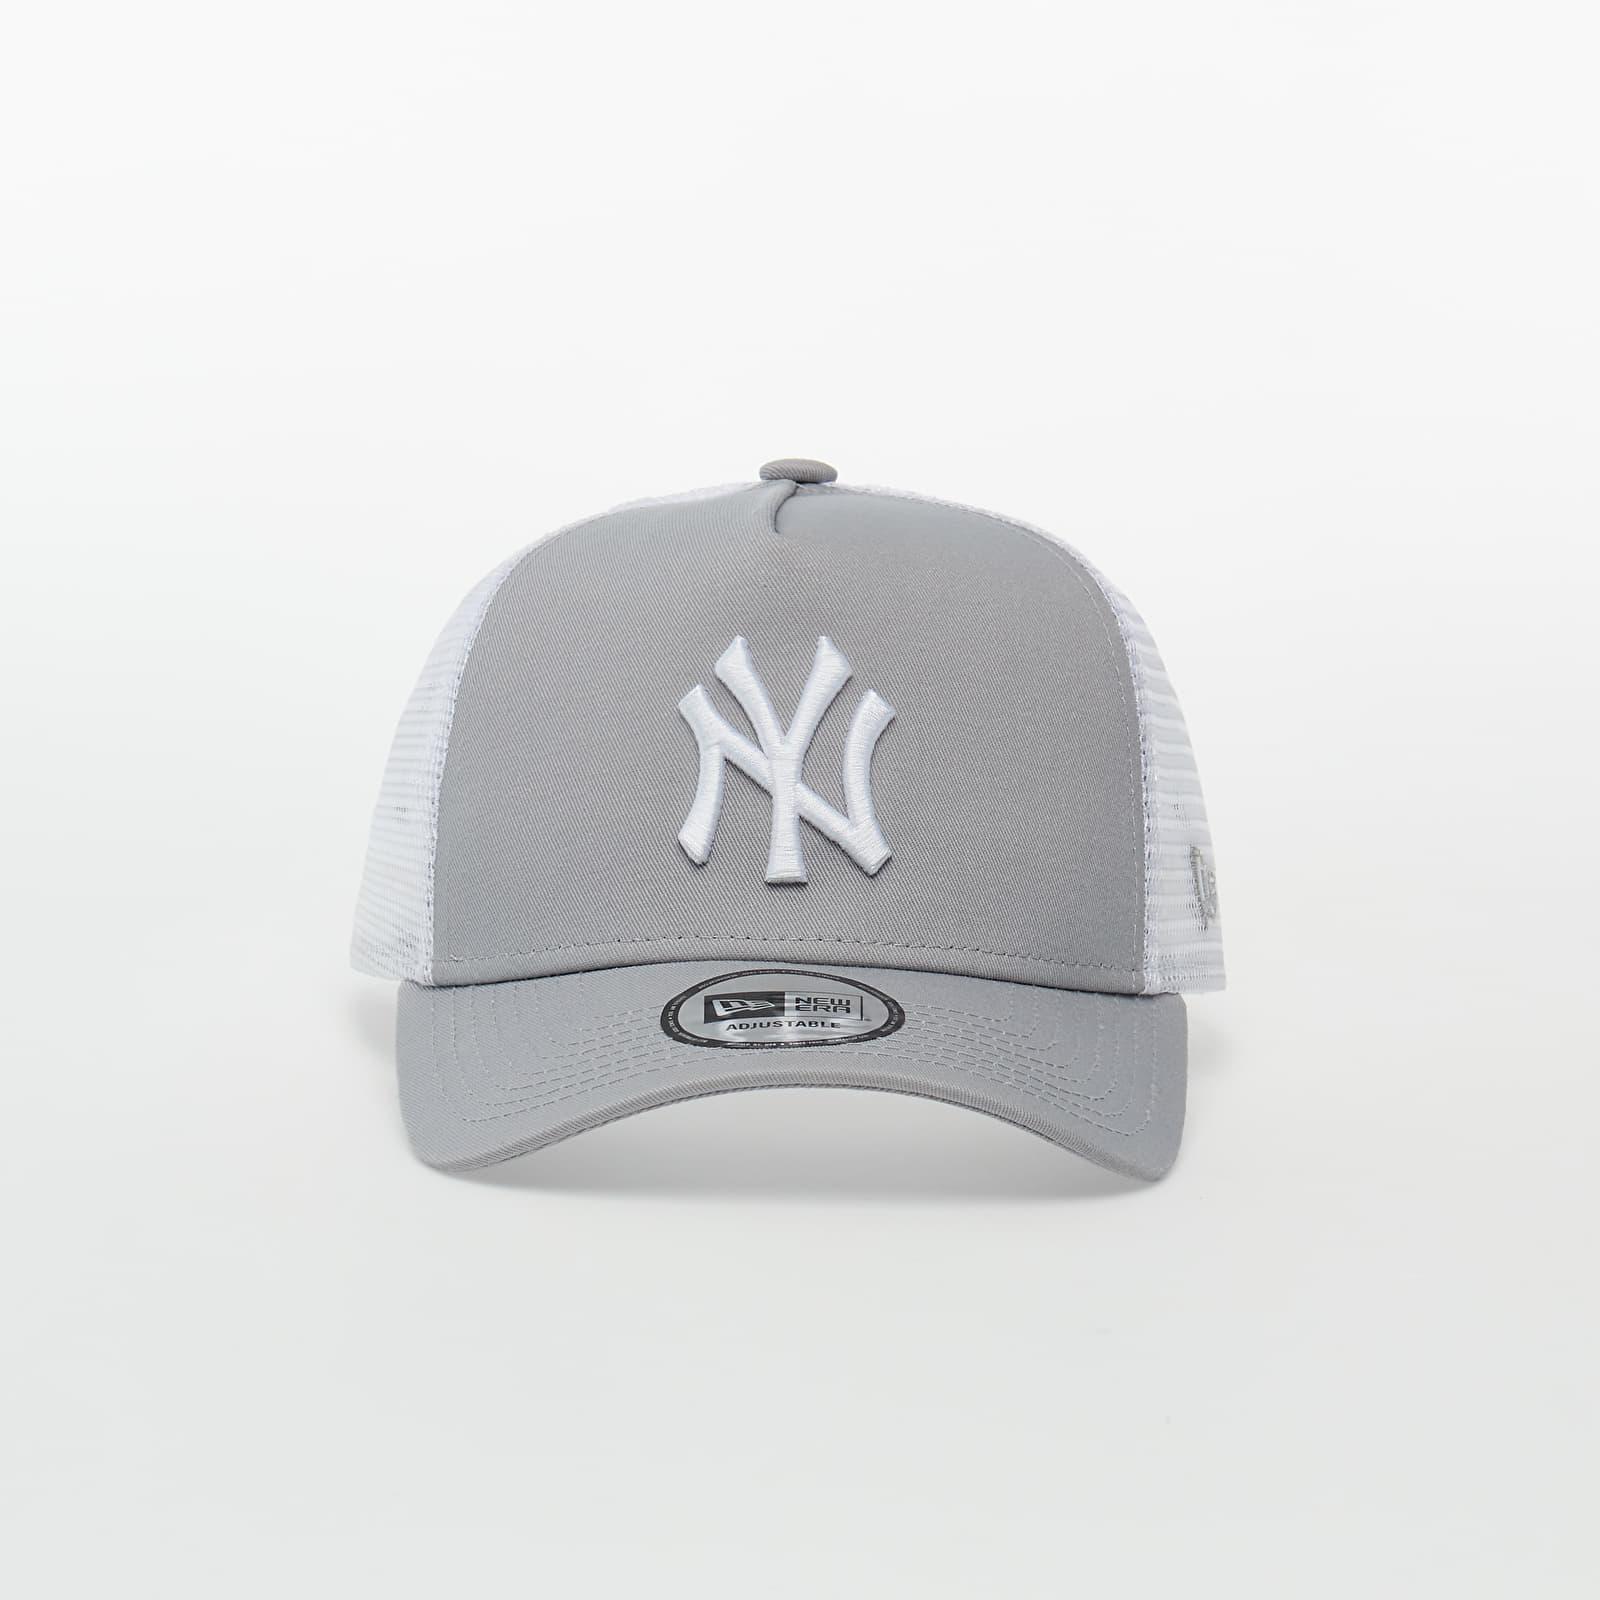 New Era MLB Clean New York Yankees Trucker Cap Grey univerzálna